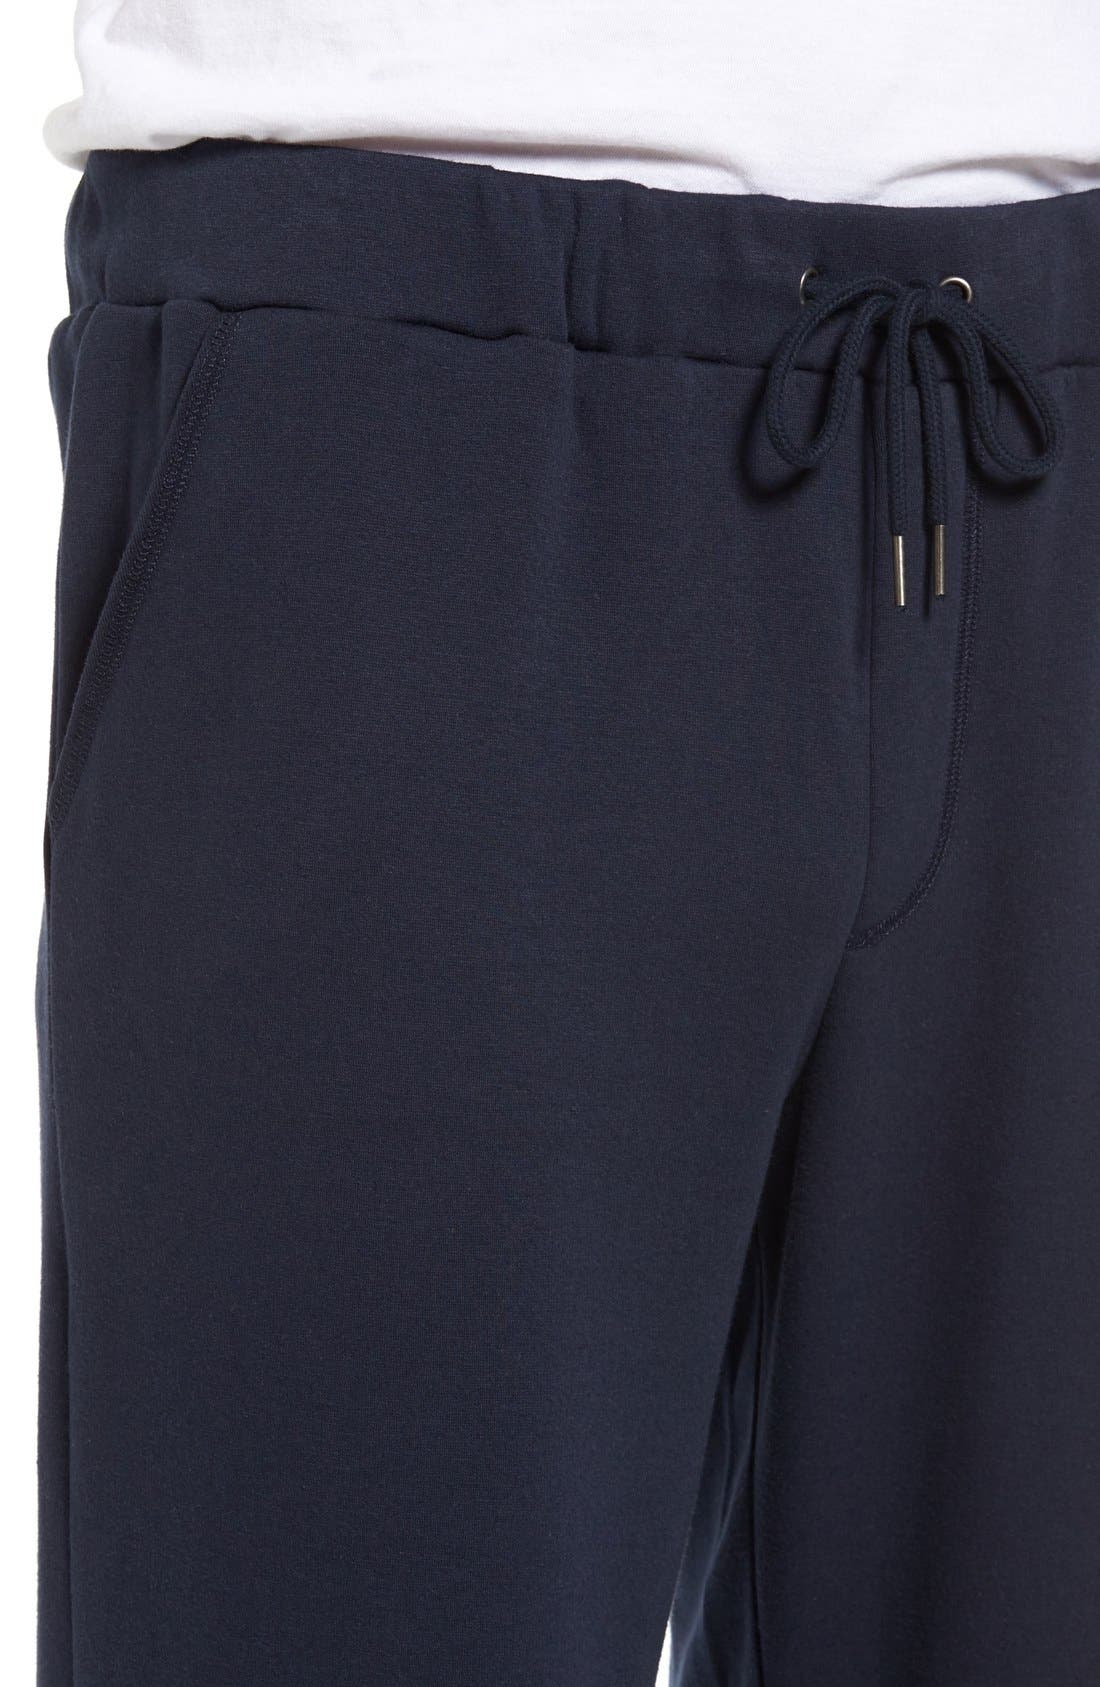 Alternate Image 4  - Nordstrom Fleece Lounge Pants